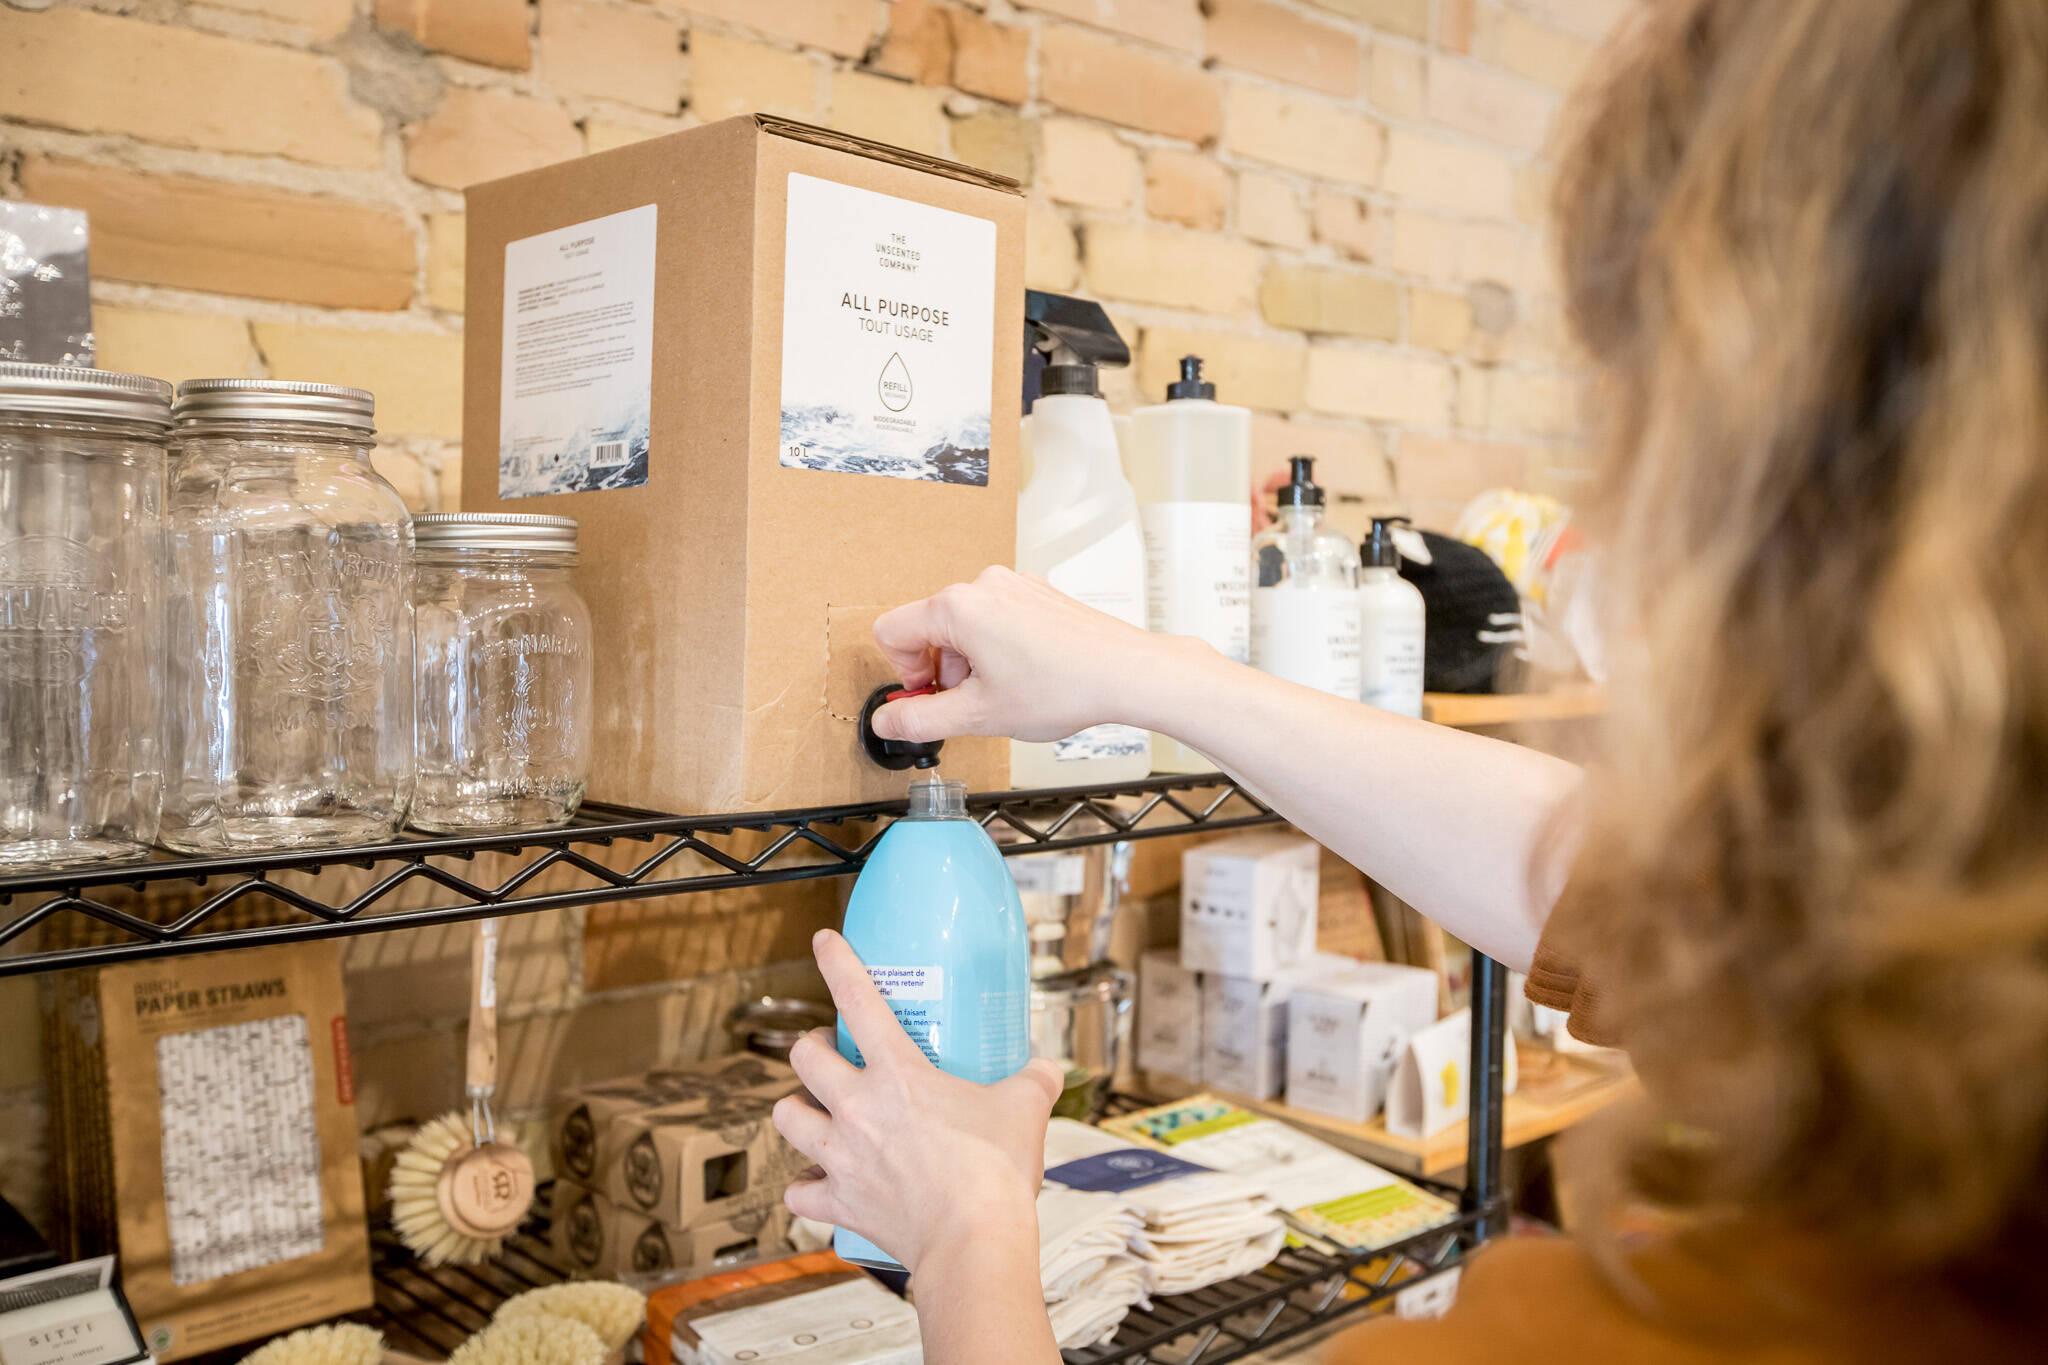 toronto reduced packaging waste free